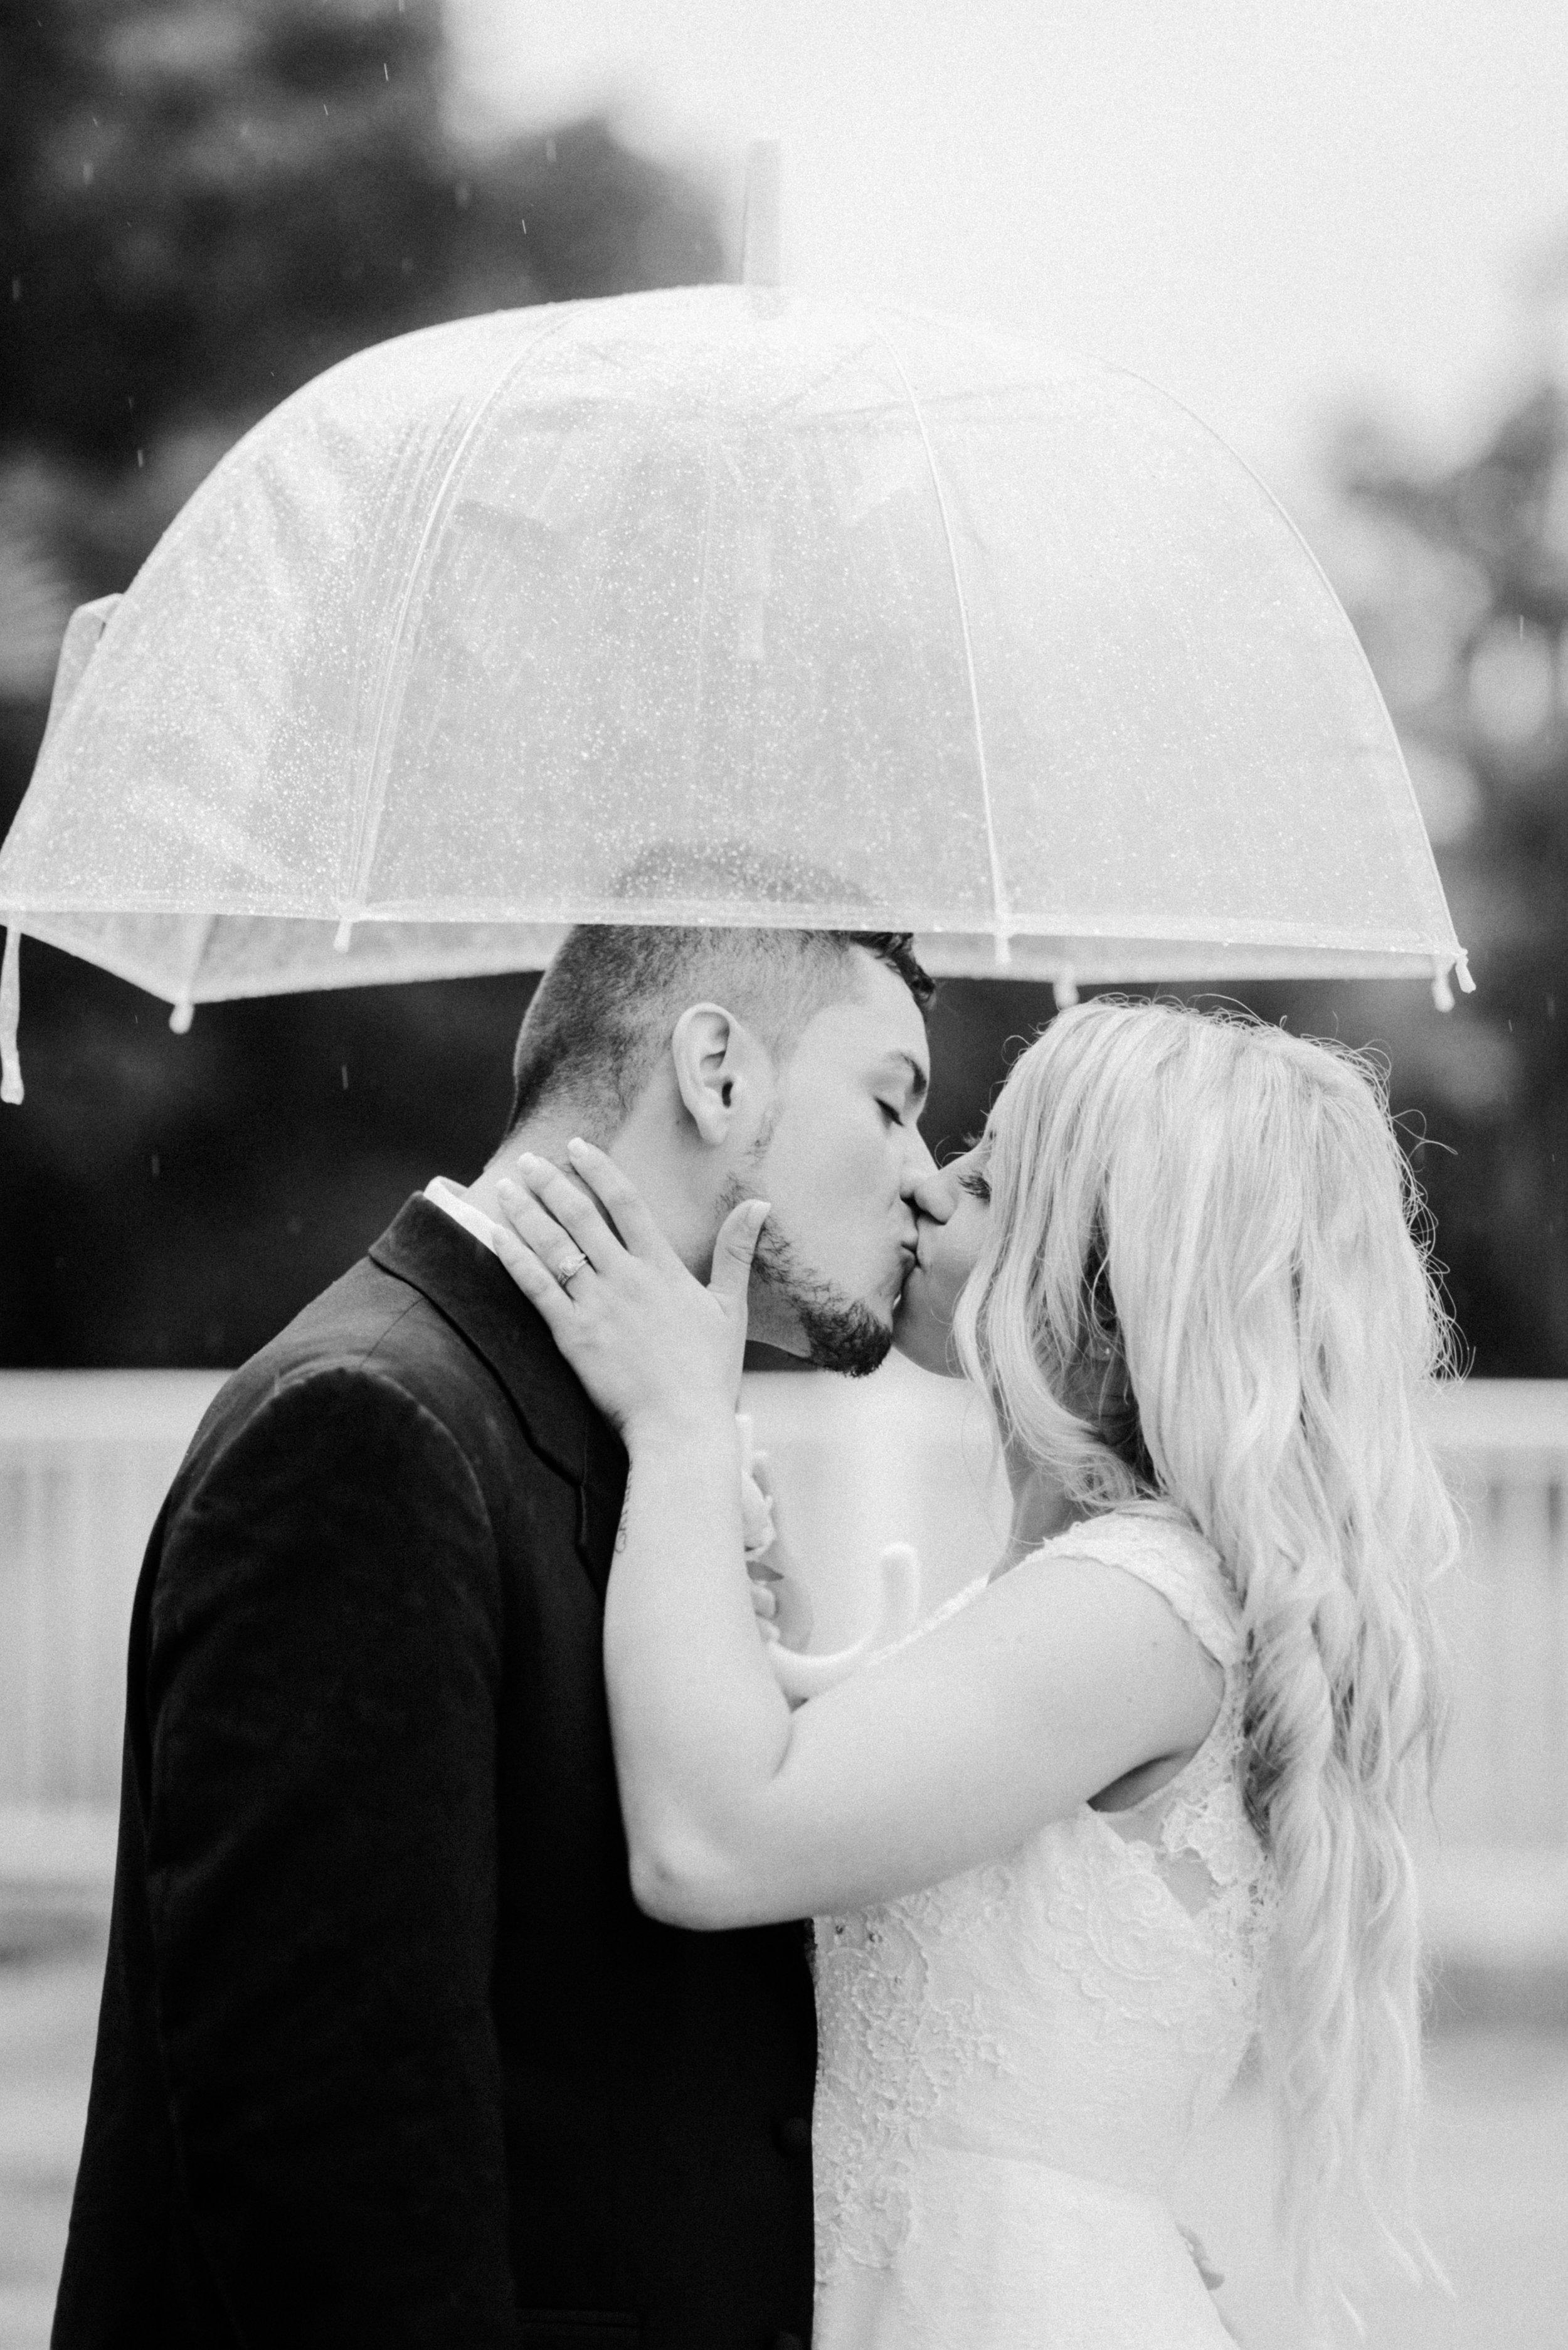 KateTaramykinStudios-Portfolio-Weddings-LeuGardens-13.jpg